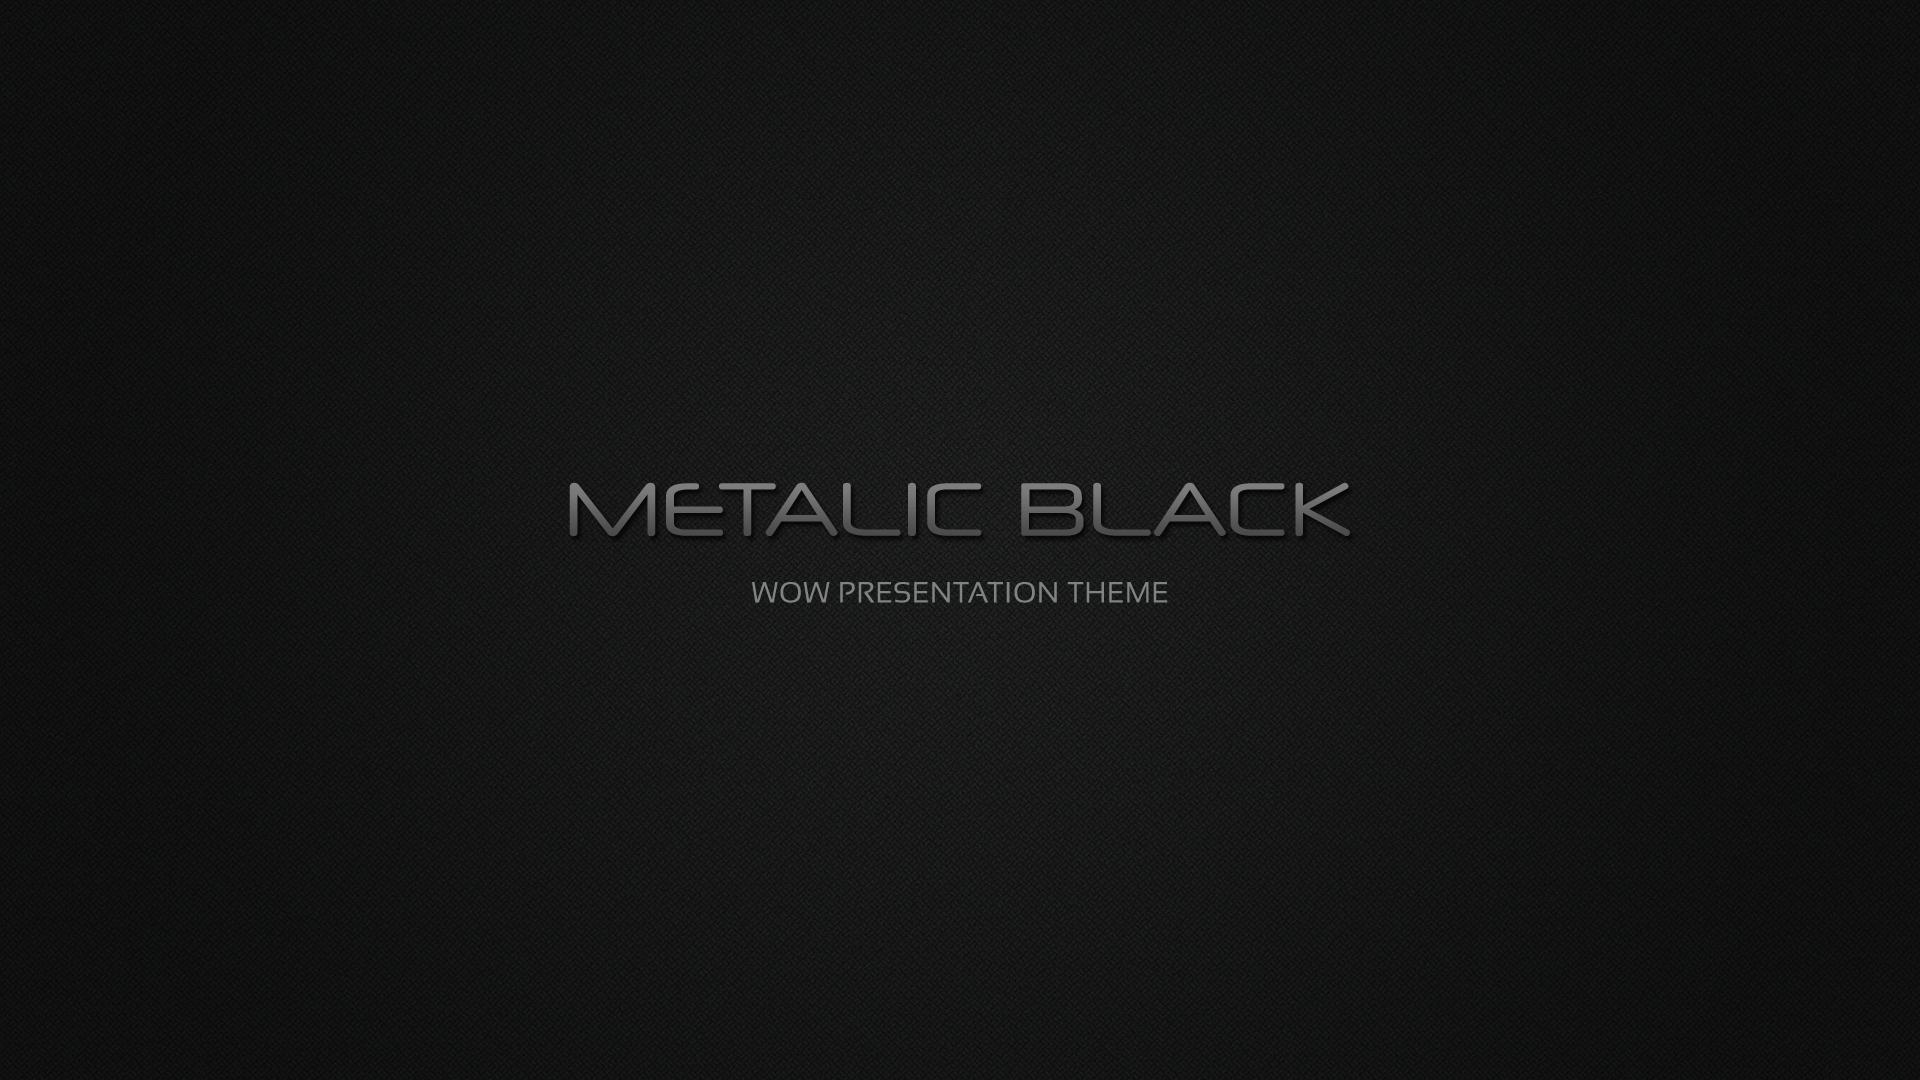 Metalic Black